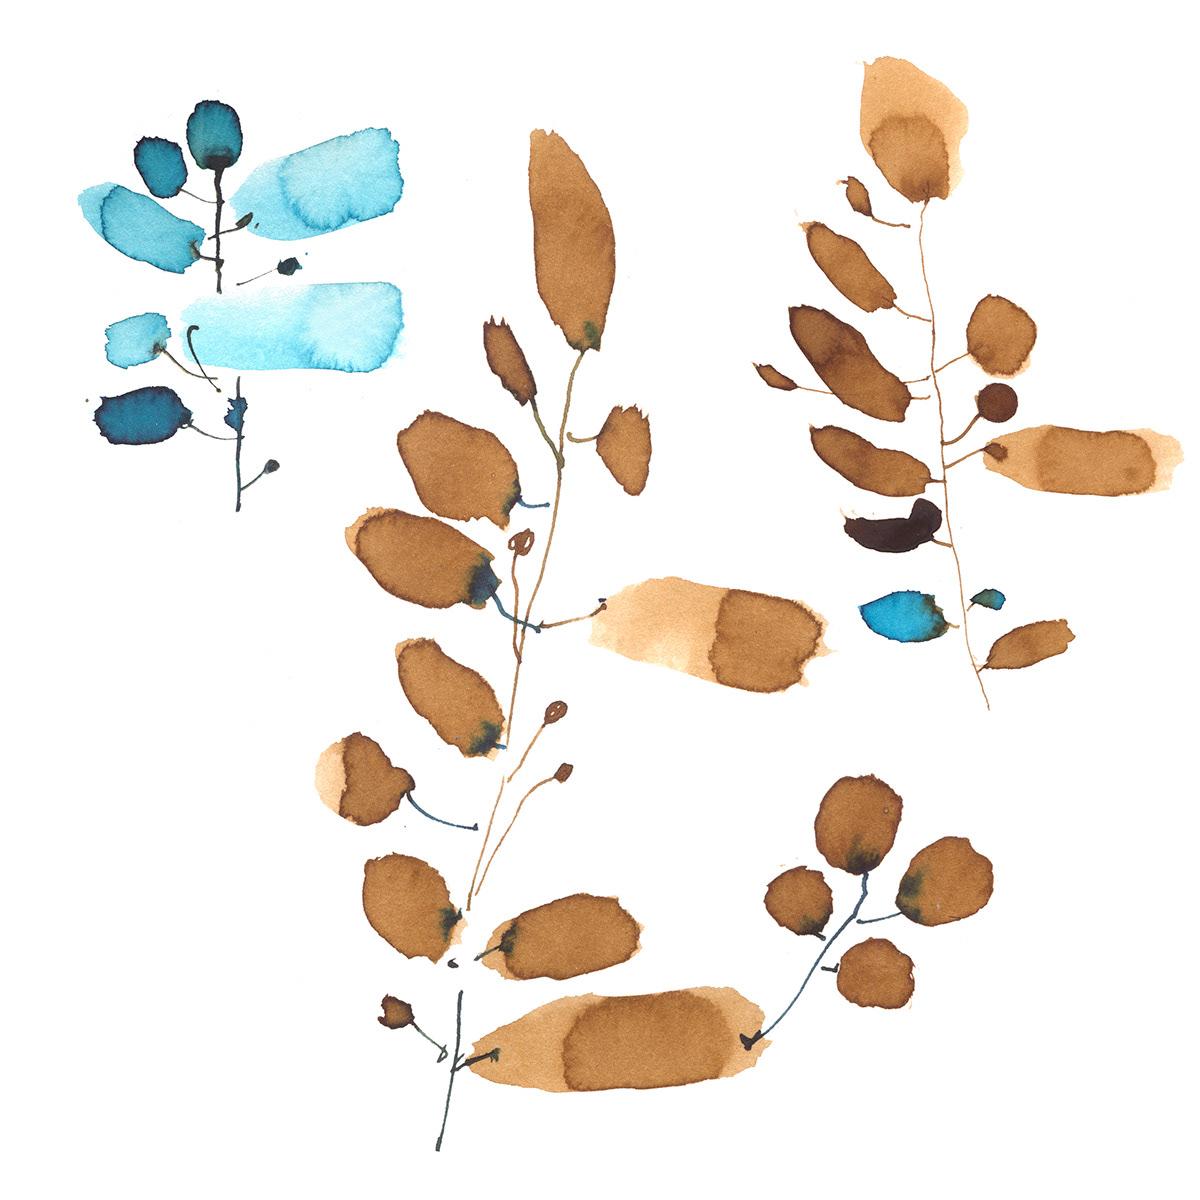 artist russian monochrome Patterns twigs watercolor акварель веточки монохром принт